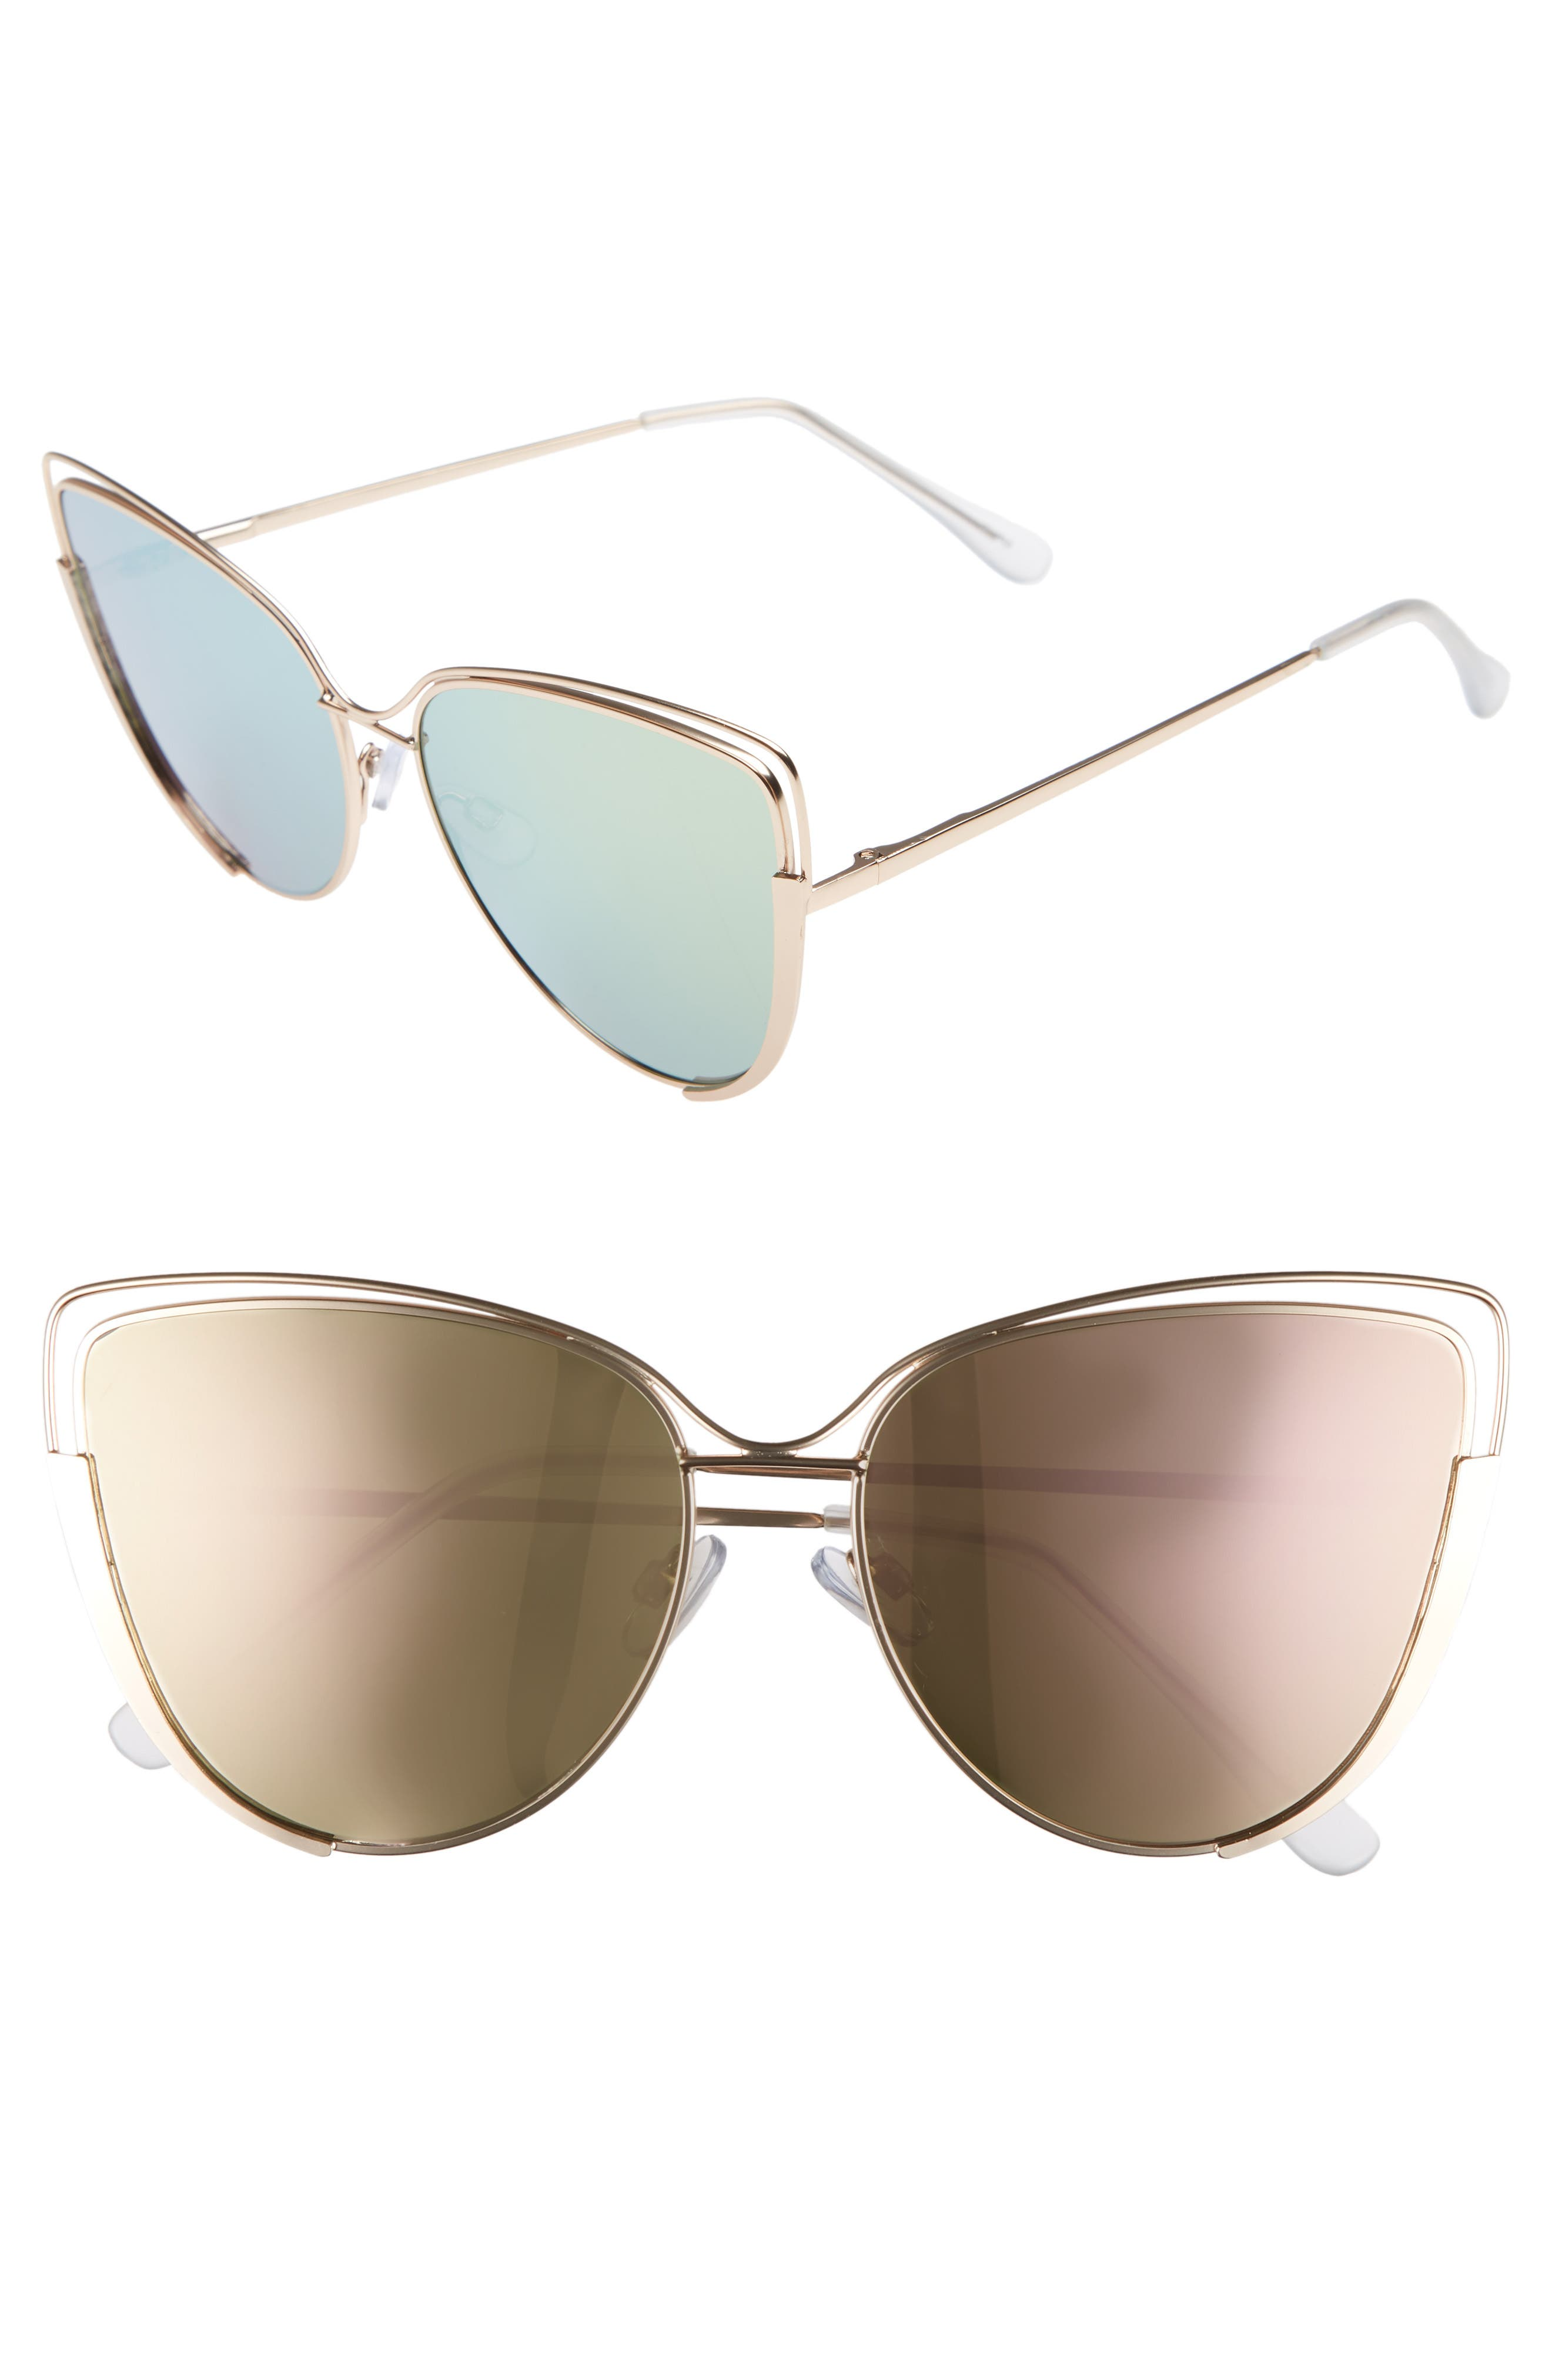 Futuristic Cat Eye Sunglasses,                             Main thumbnail 1, color,                             Gold